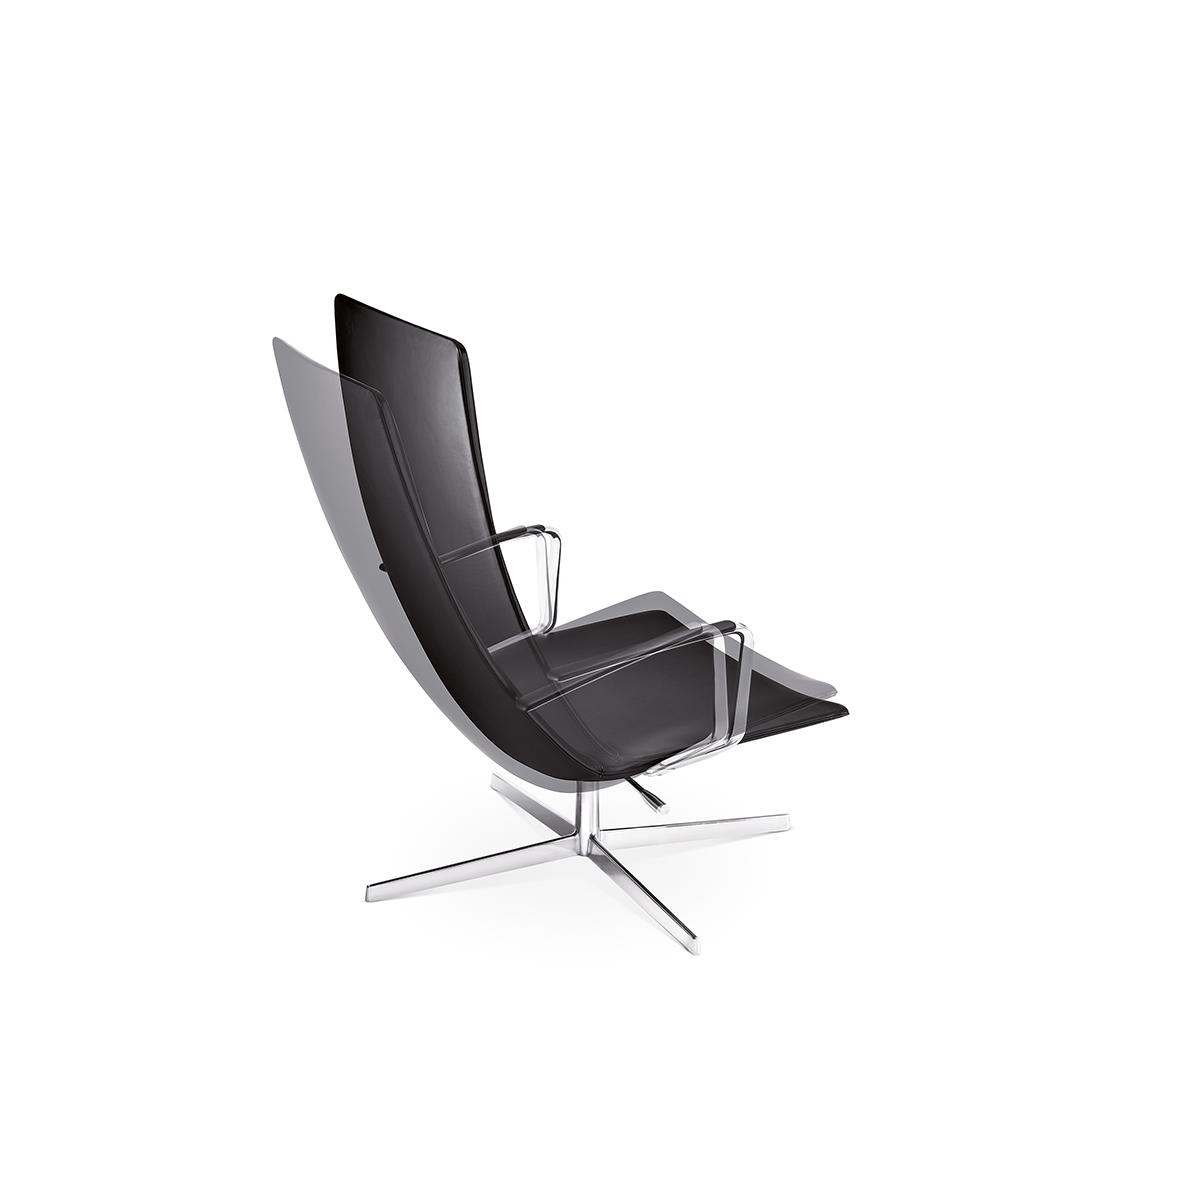 Marvelous Catifa 70 4 Ways Arper Design Furniture Beatyapartments Chair Design Images Beatyapartmentscom